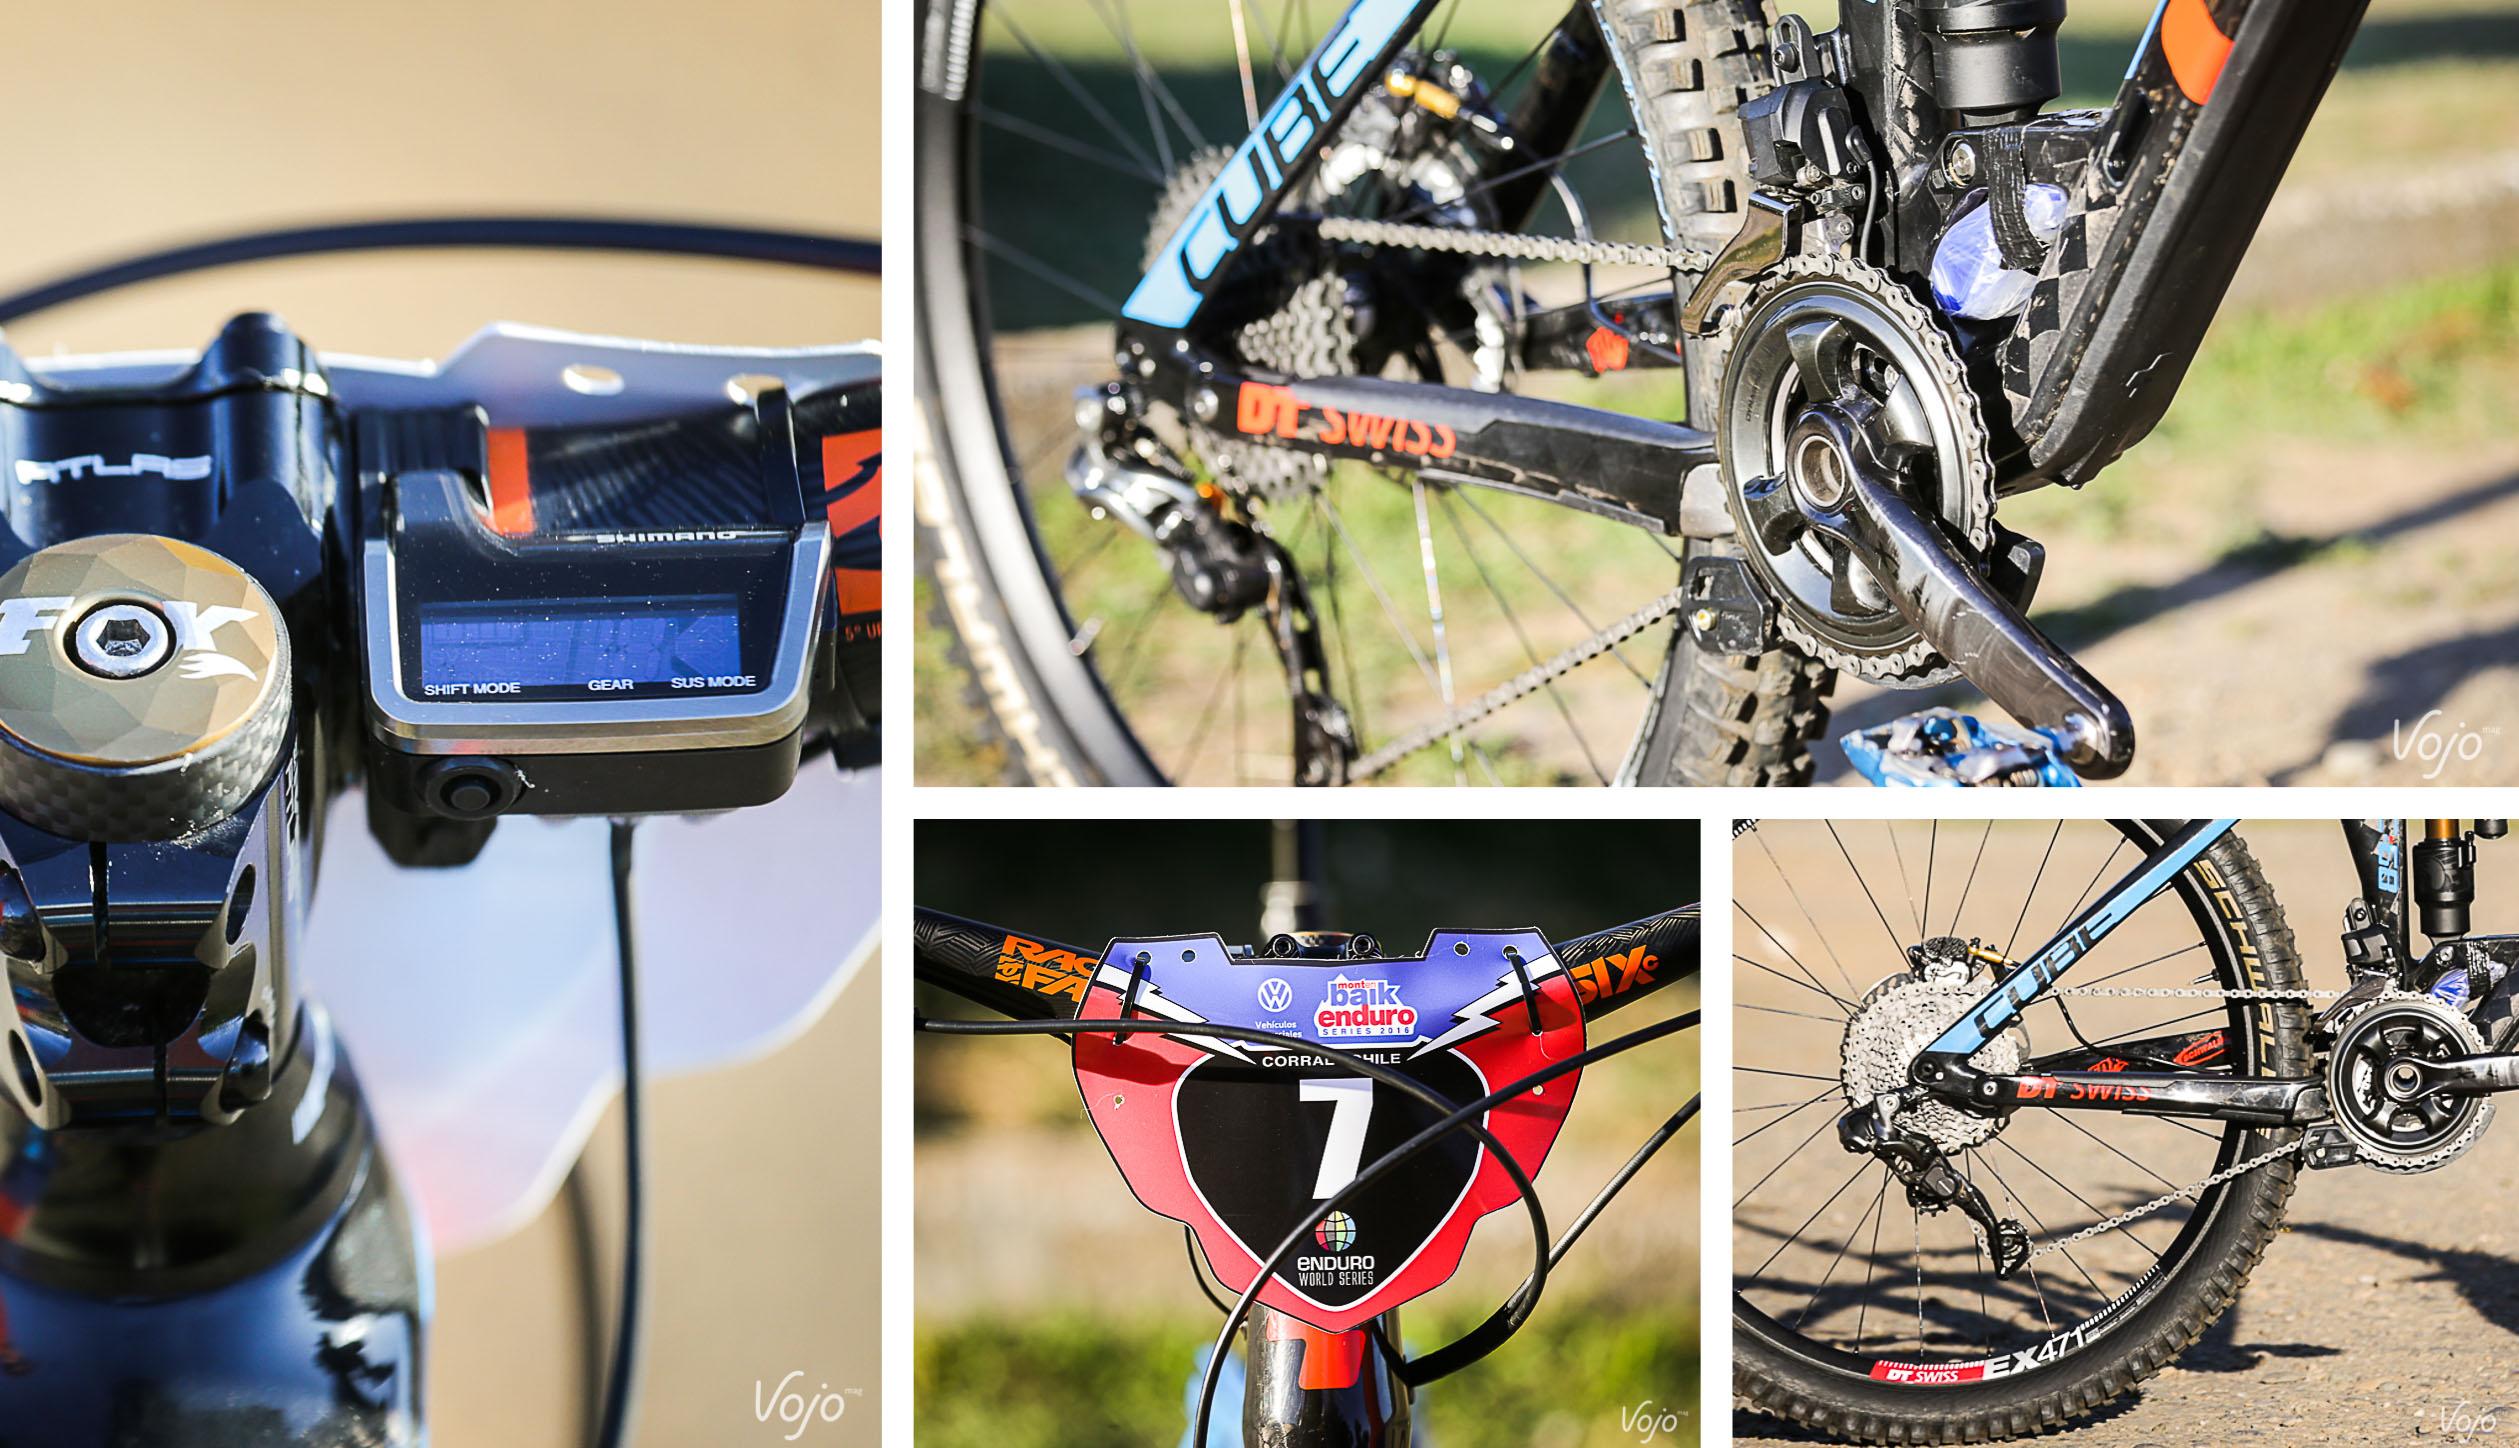 8-Bike_Check_EWS_2016_Copyright_Reuiller_Vojomag-1